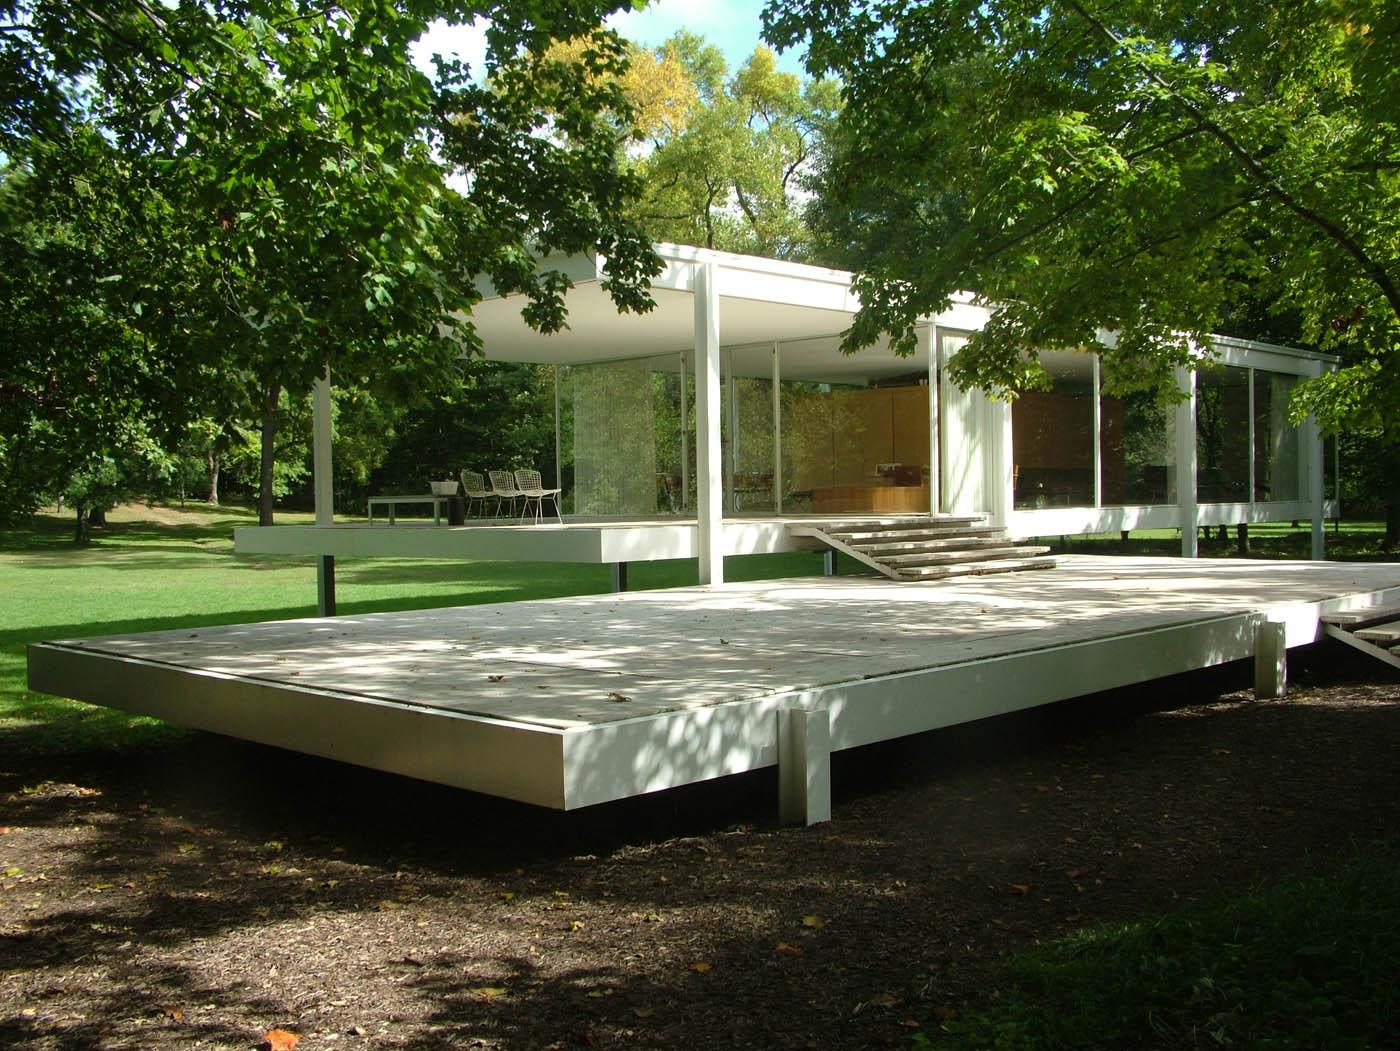 Farnsworth house vince michael for The farnsworth